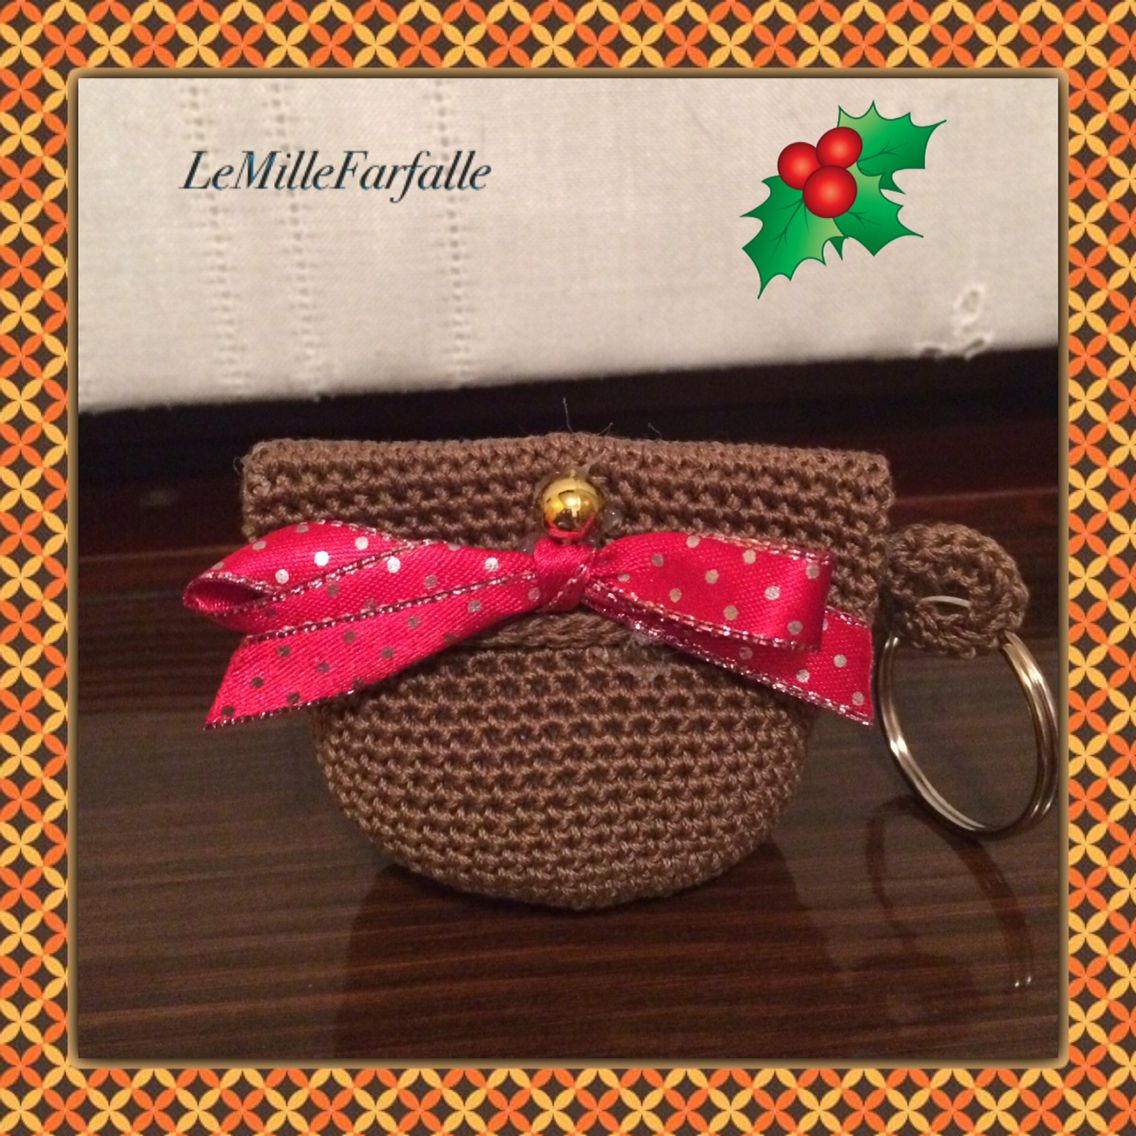 Mini-borsetta littlebag